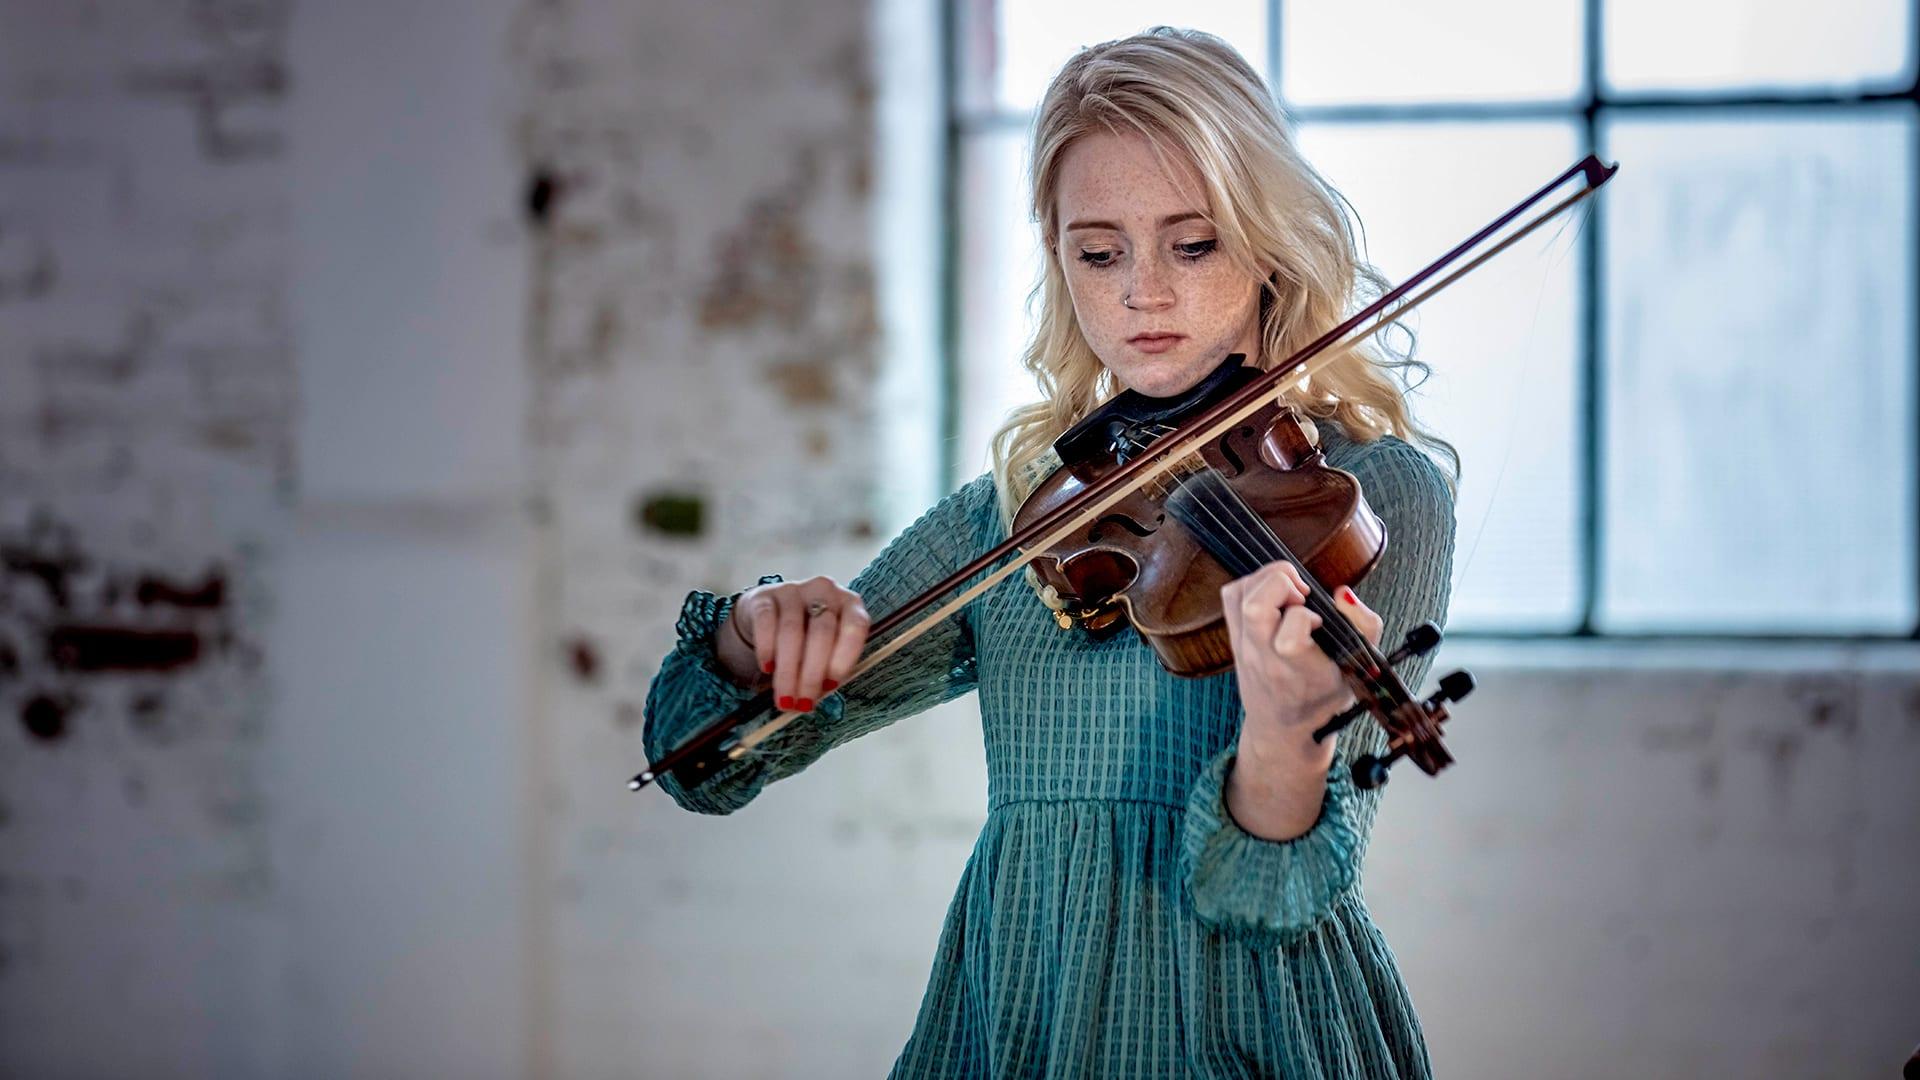 Sruth | Player | TG4 | Irish Television Channel, Súil Eile